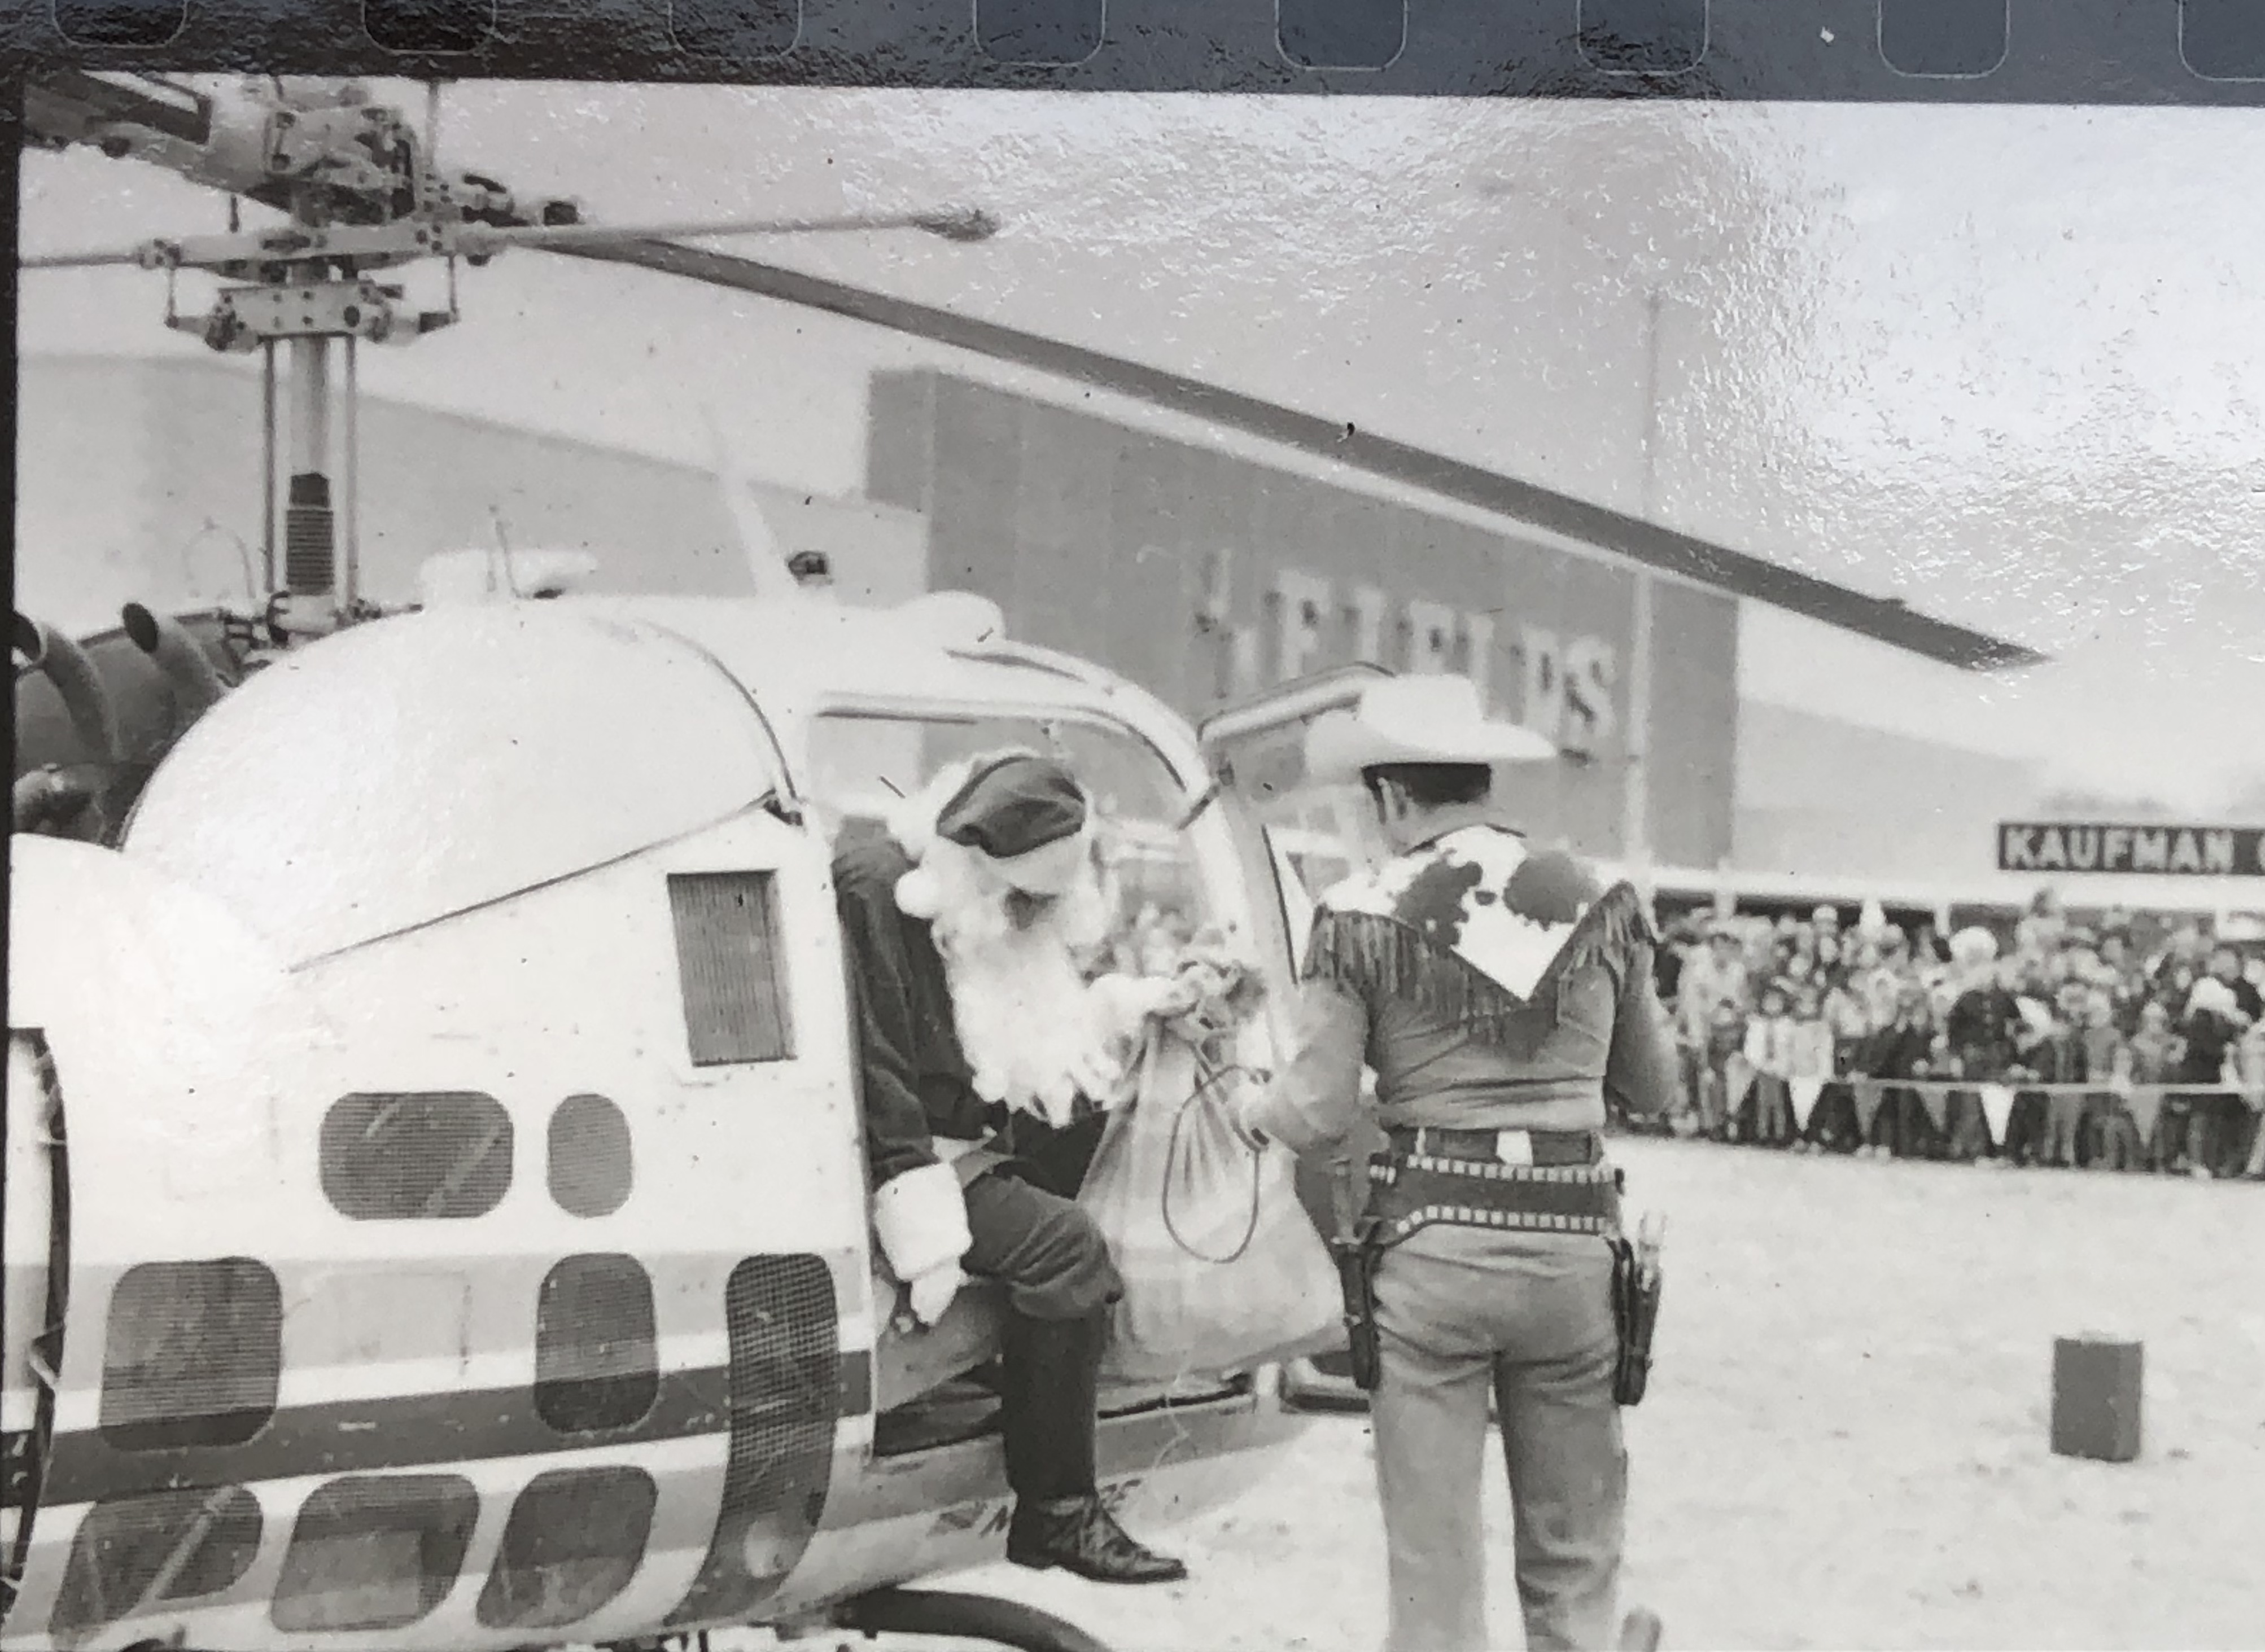 Santa emerges from chopper